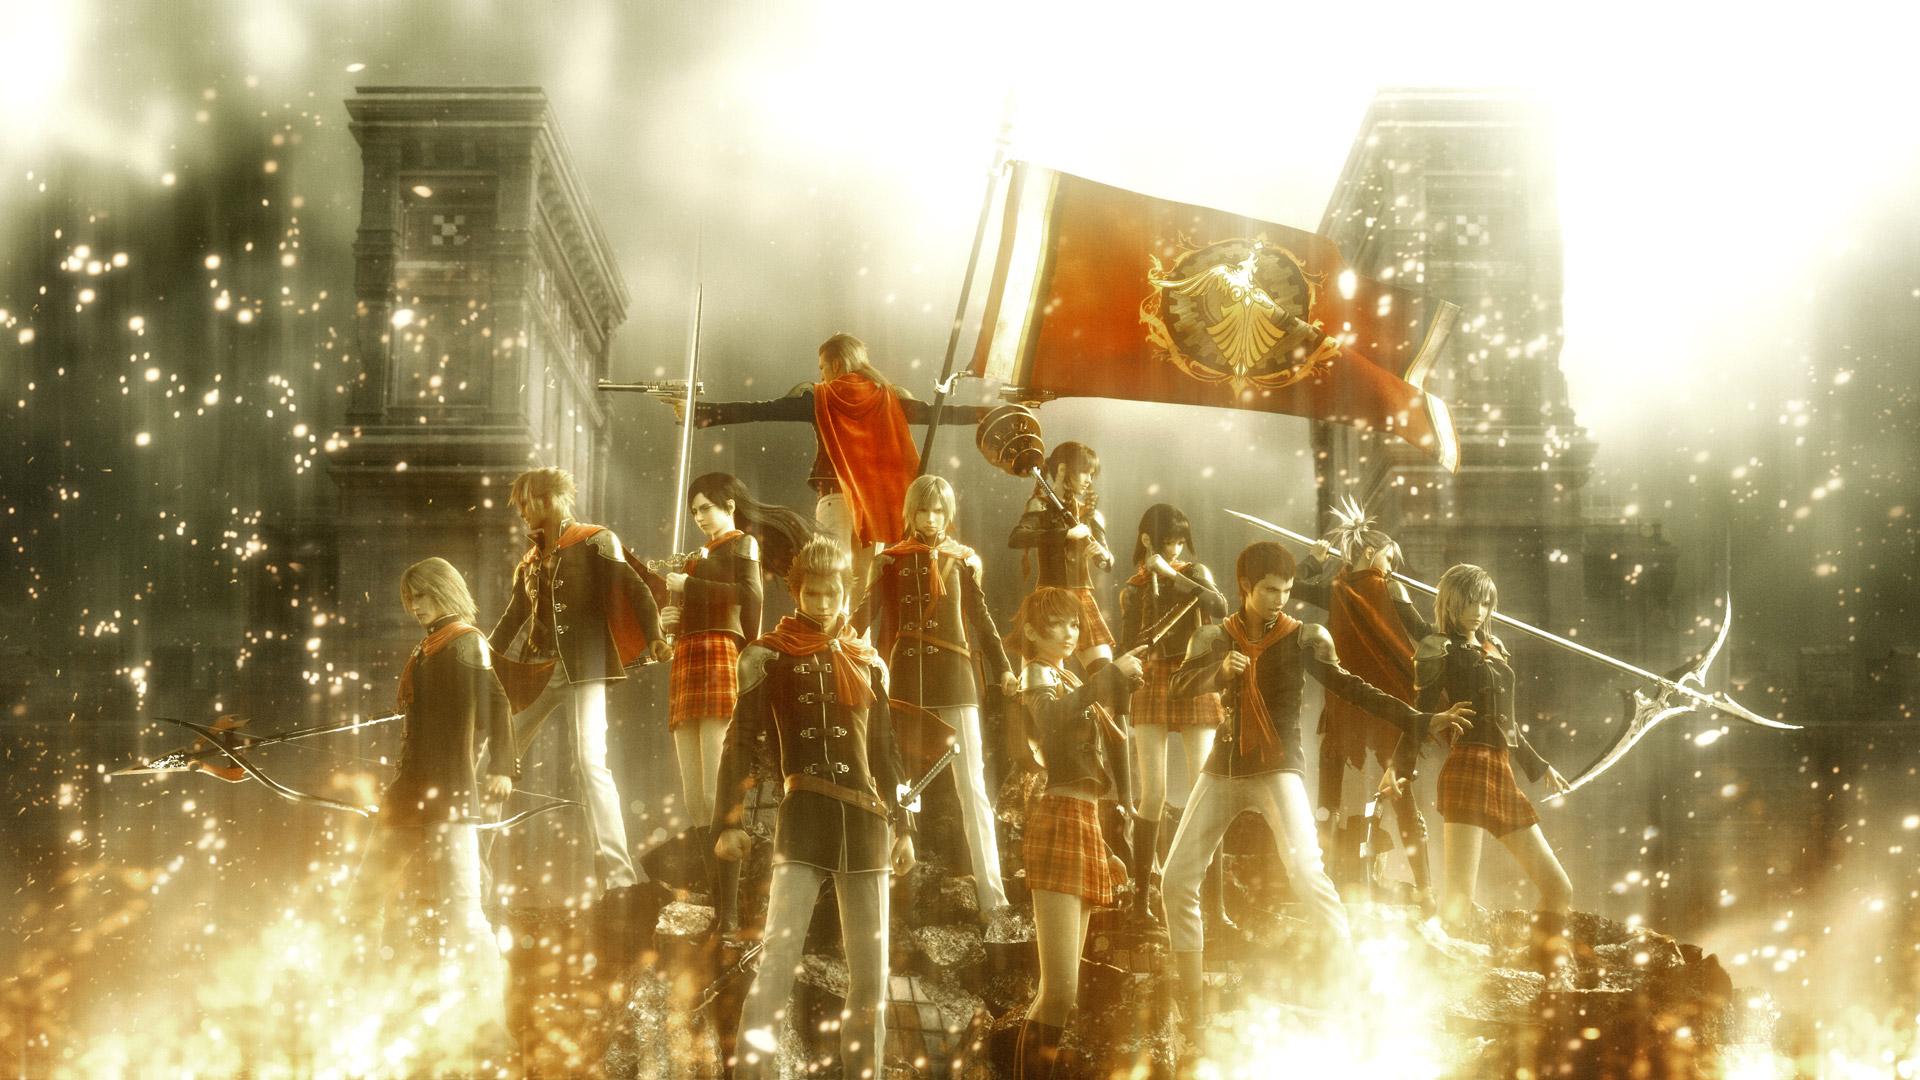 Final Fantasy Type-0 wallpaper 4